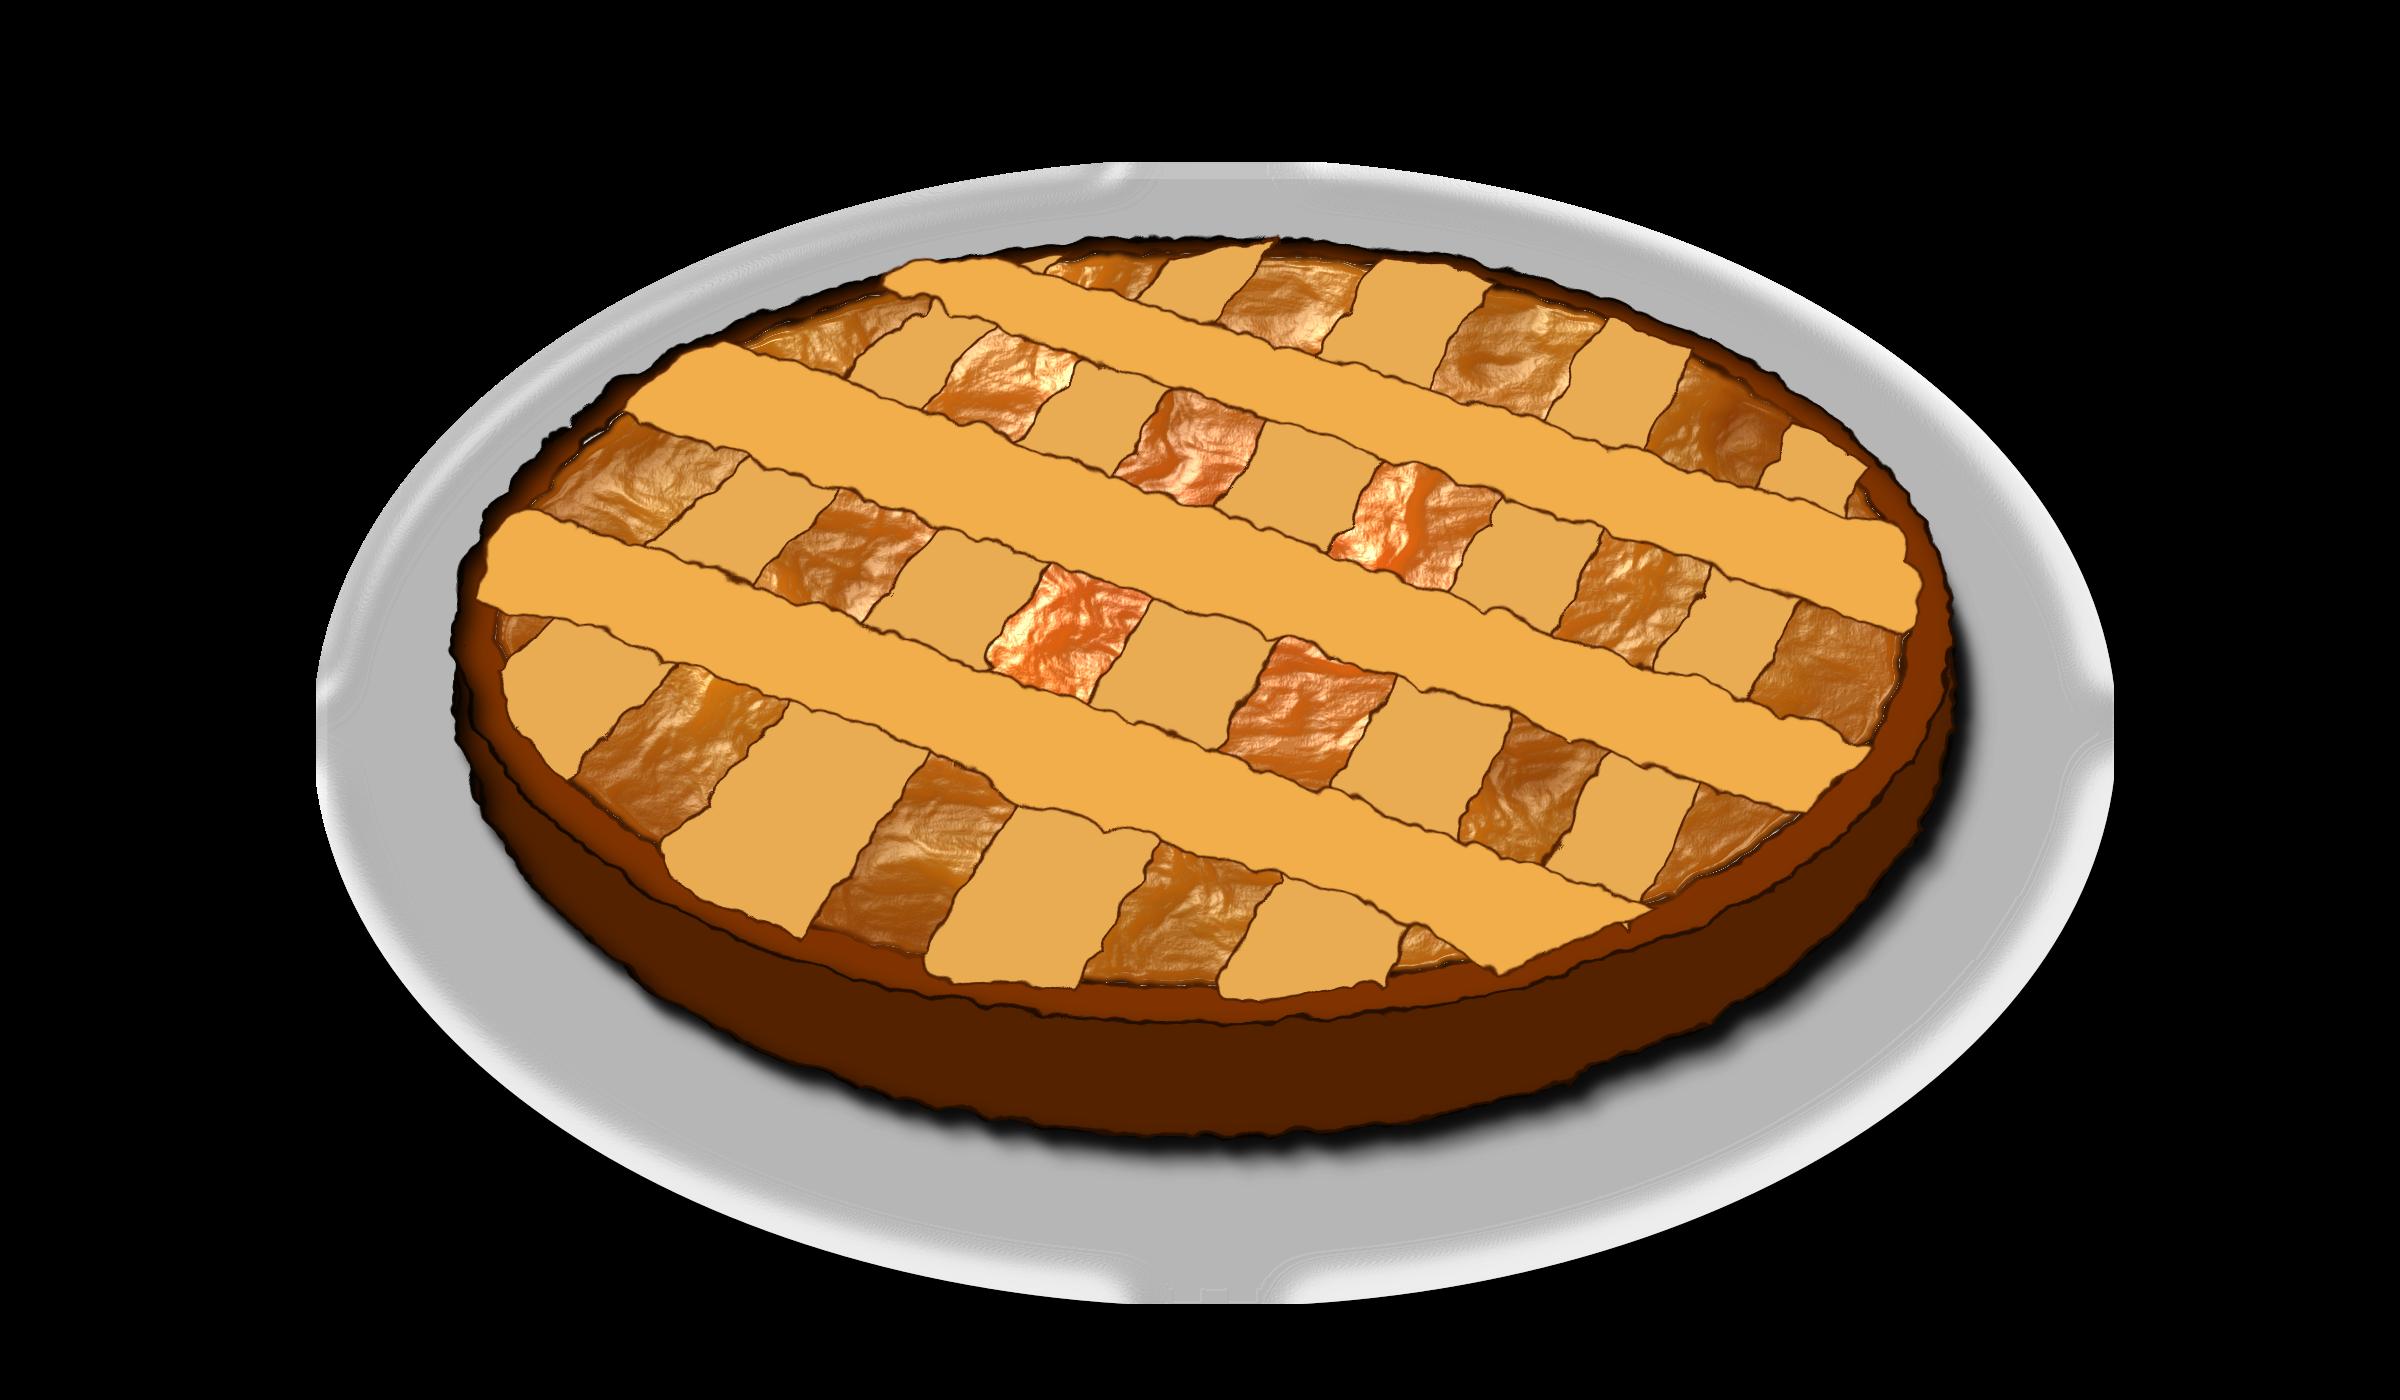 Tart clipart Clipart Marmalade Tart Tart Marmalade